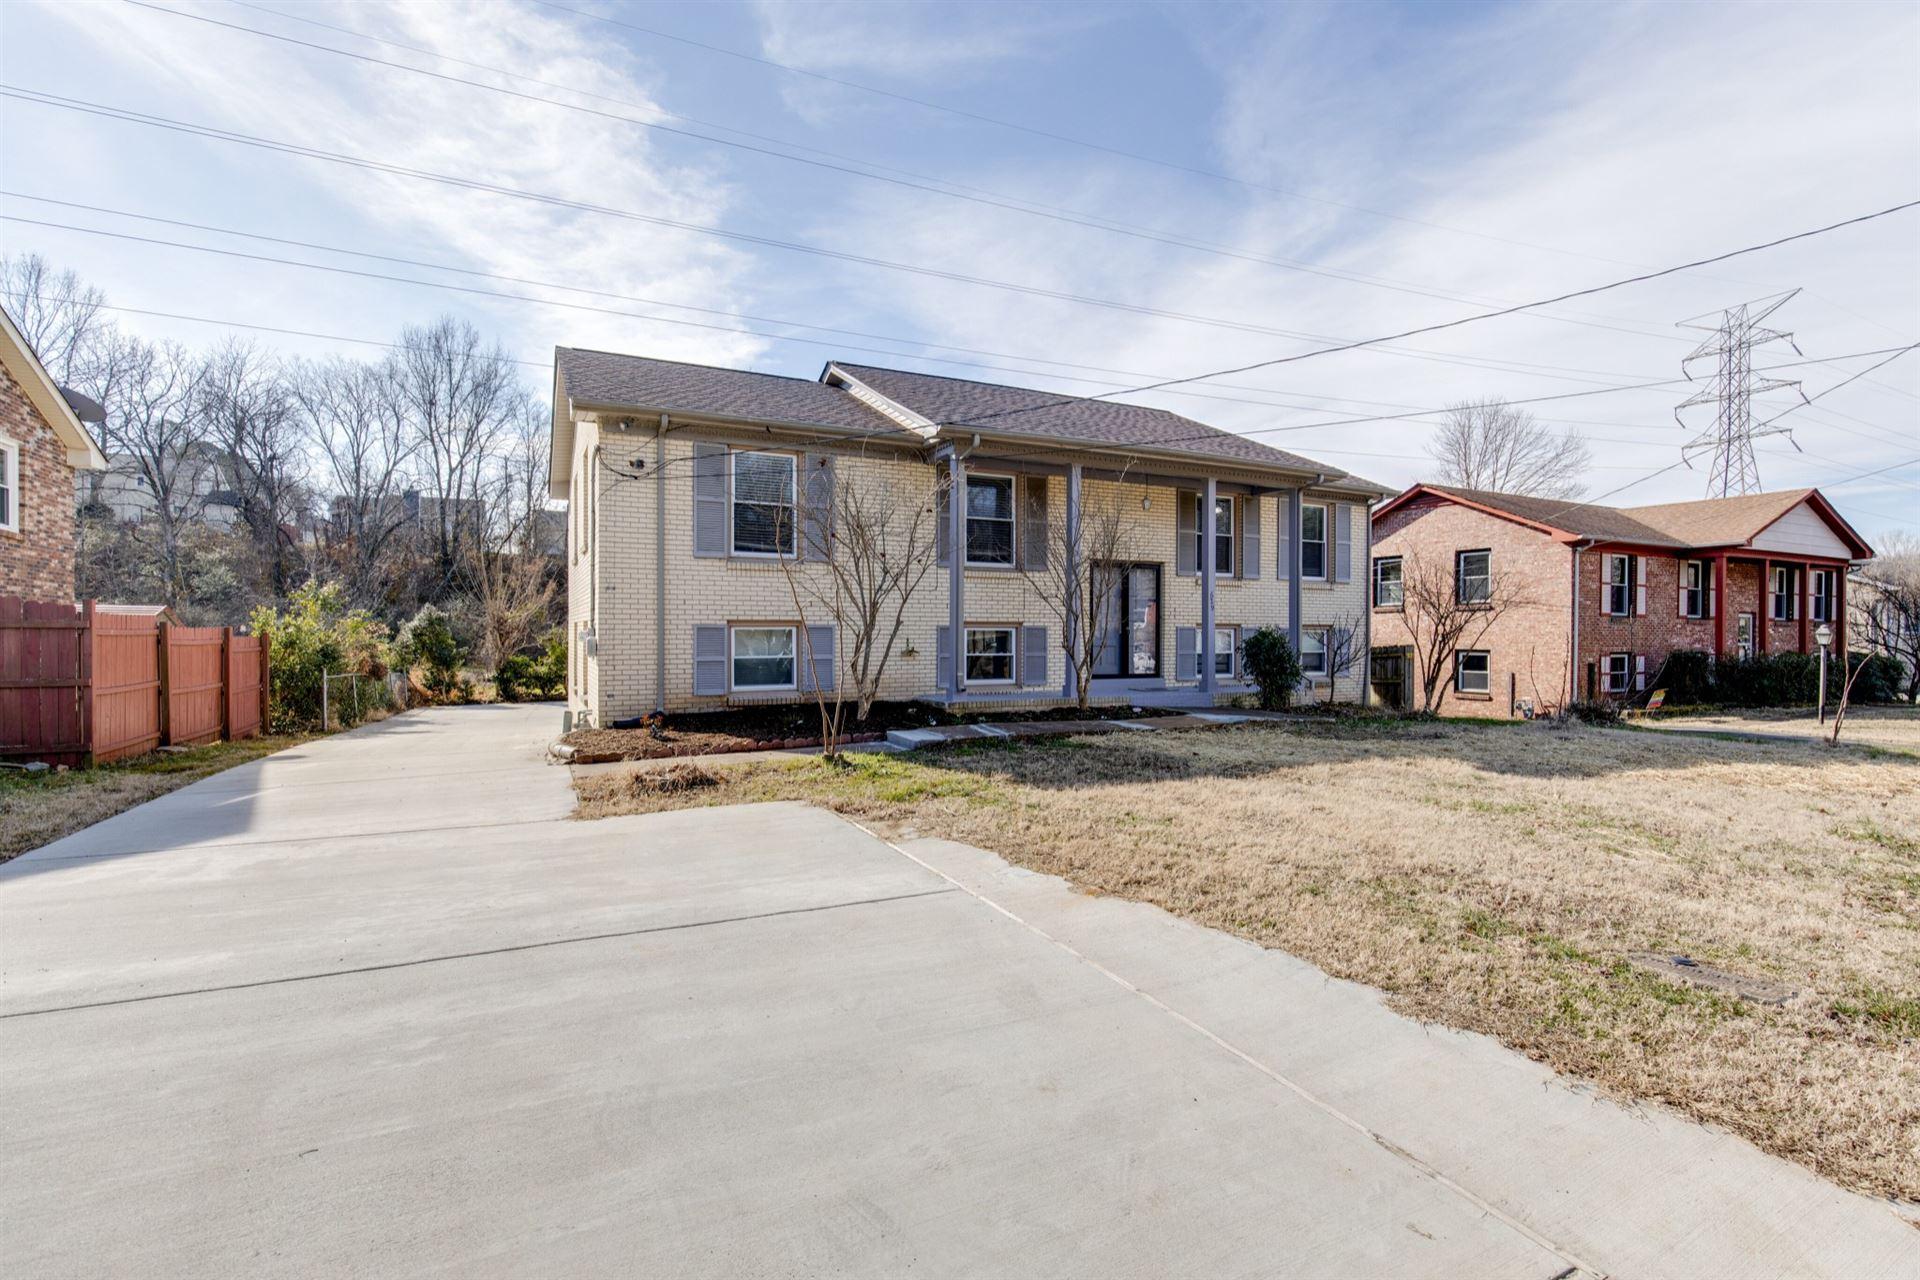 629 Huntington Pkwy, Nashville, TN 37211 - MLS#: 2221300